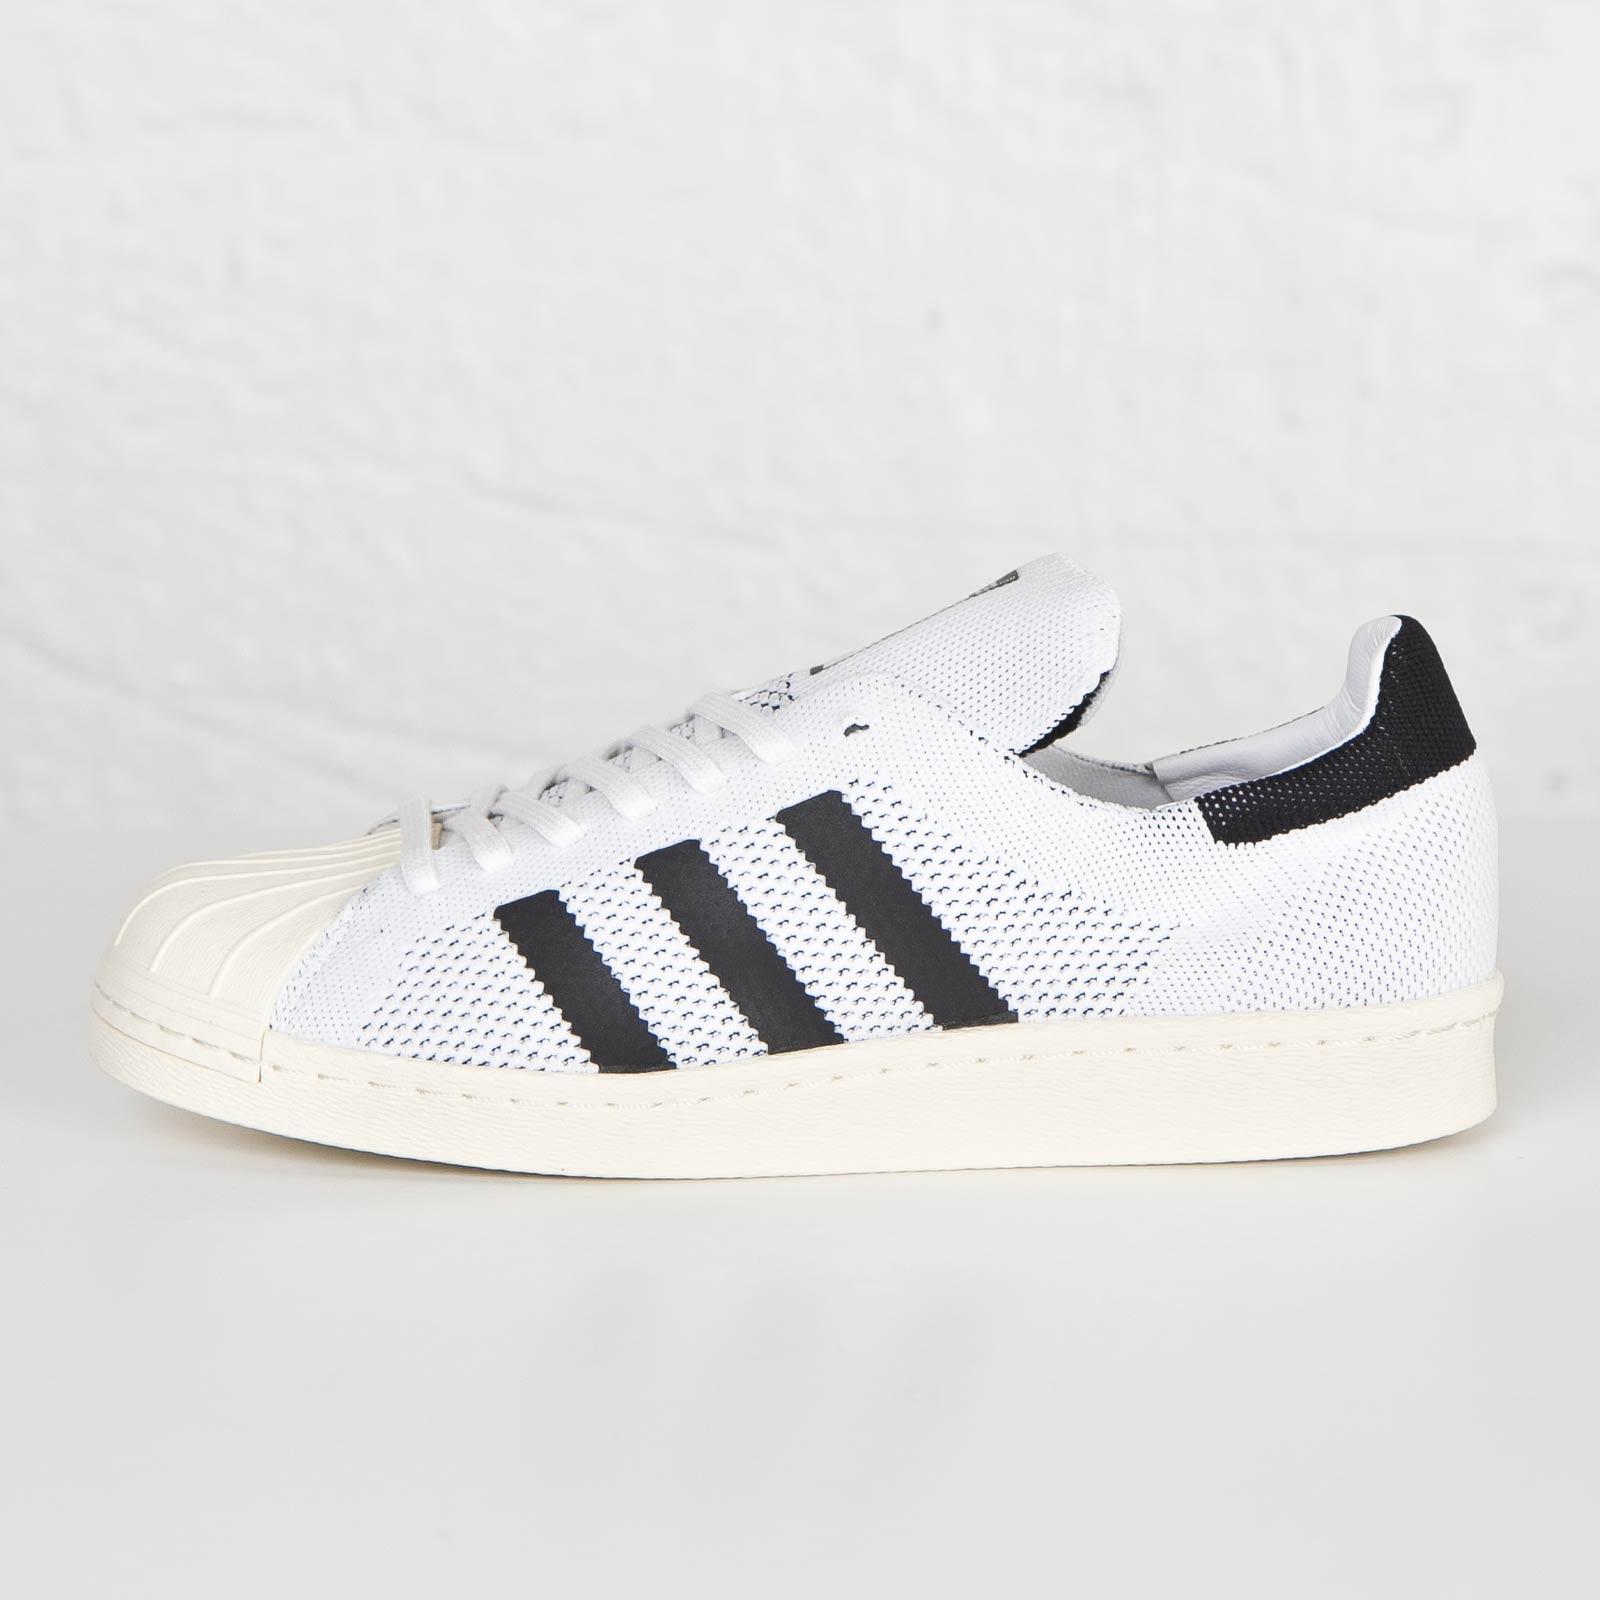 promo code 3ae0f 31356 adidas Superstar 80s Primeknit - S82779 - Sneakersnstuff   sneakers    streetwear online since 1999